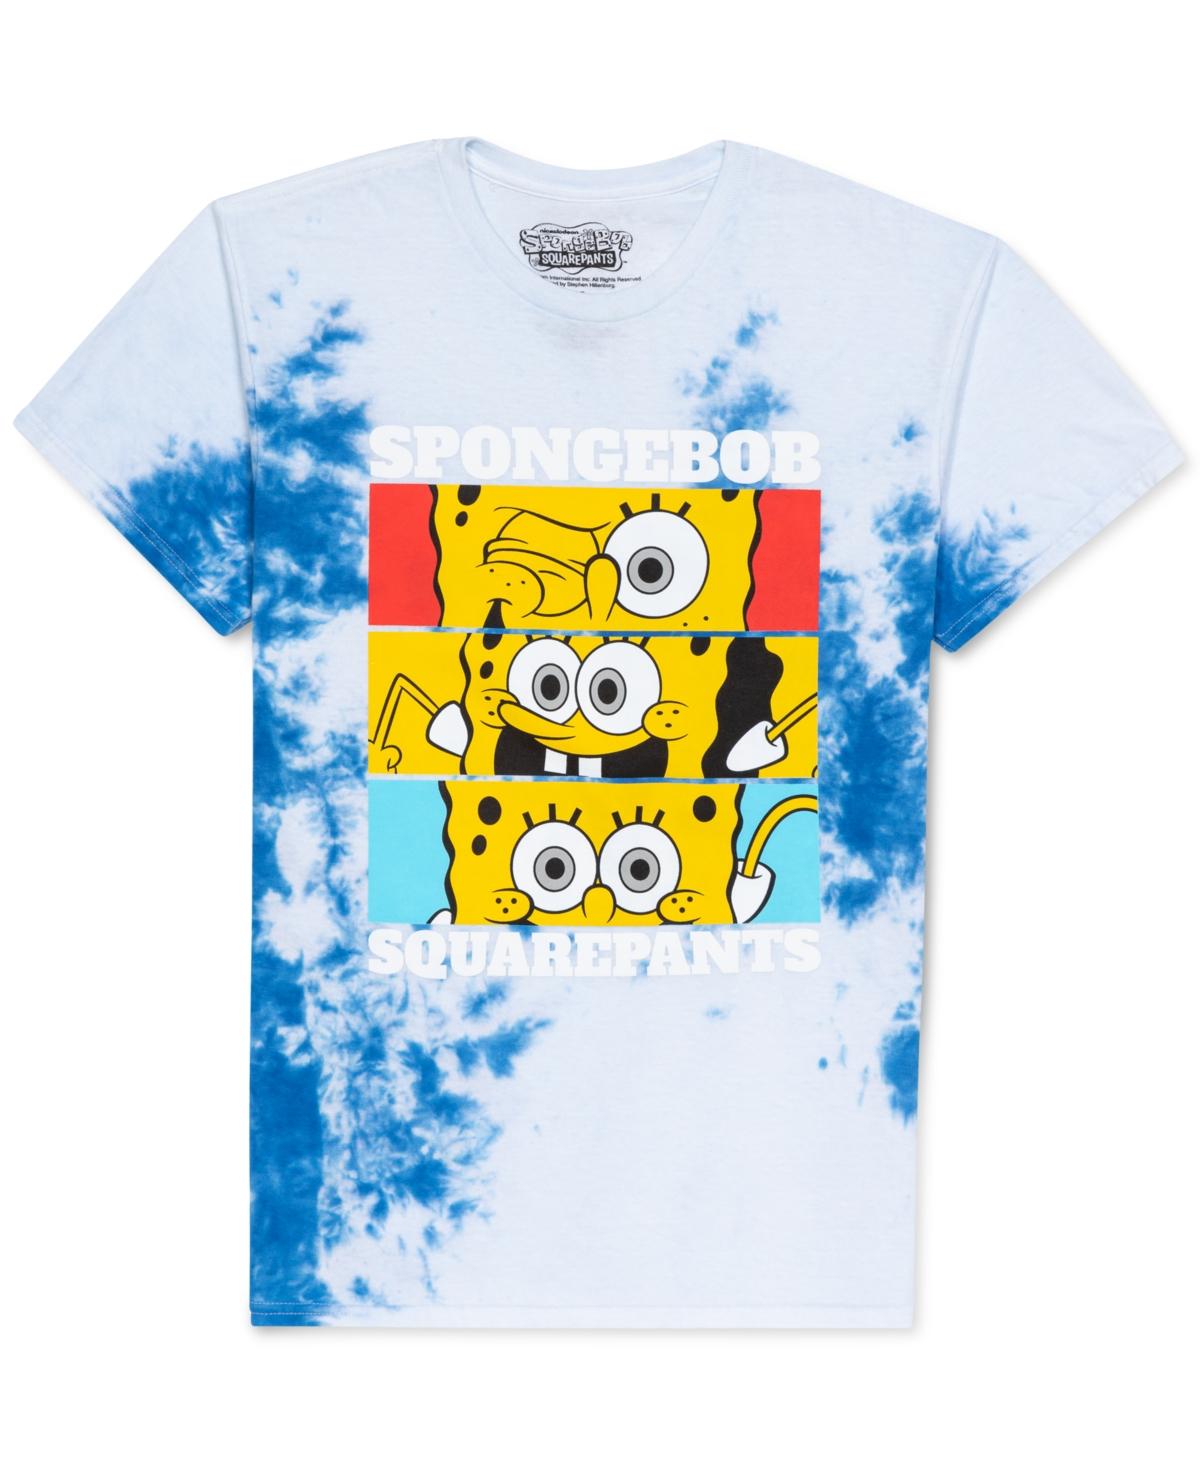 Spongebob Silly Faces Tie Dye Men's Graphic T-Shirt